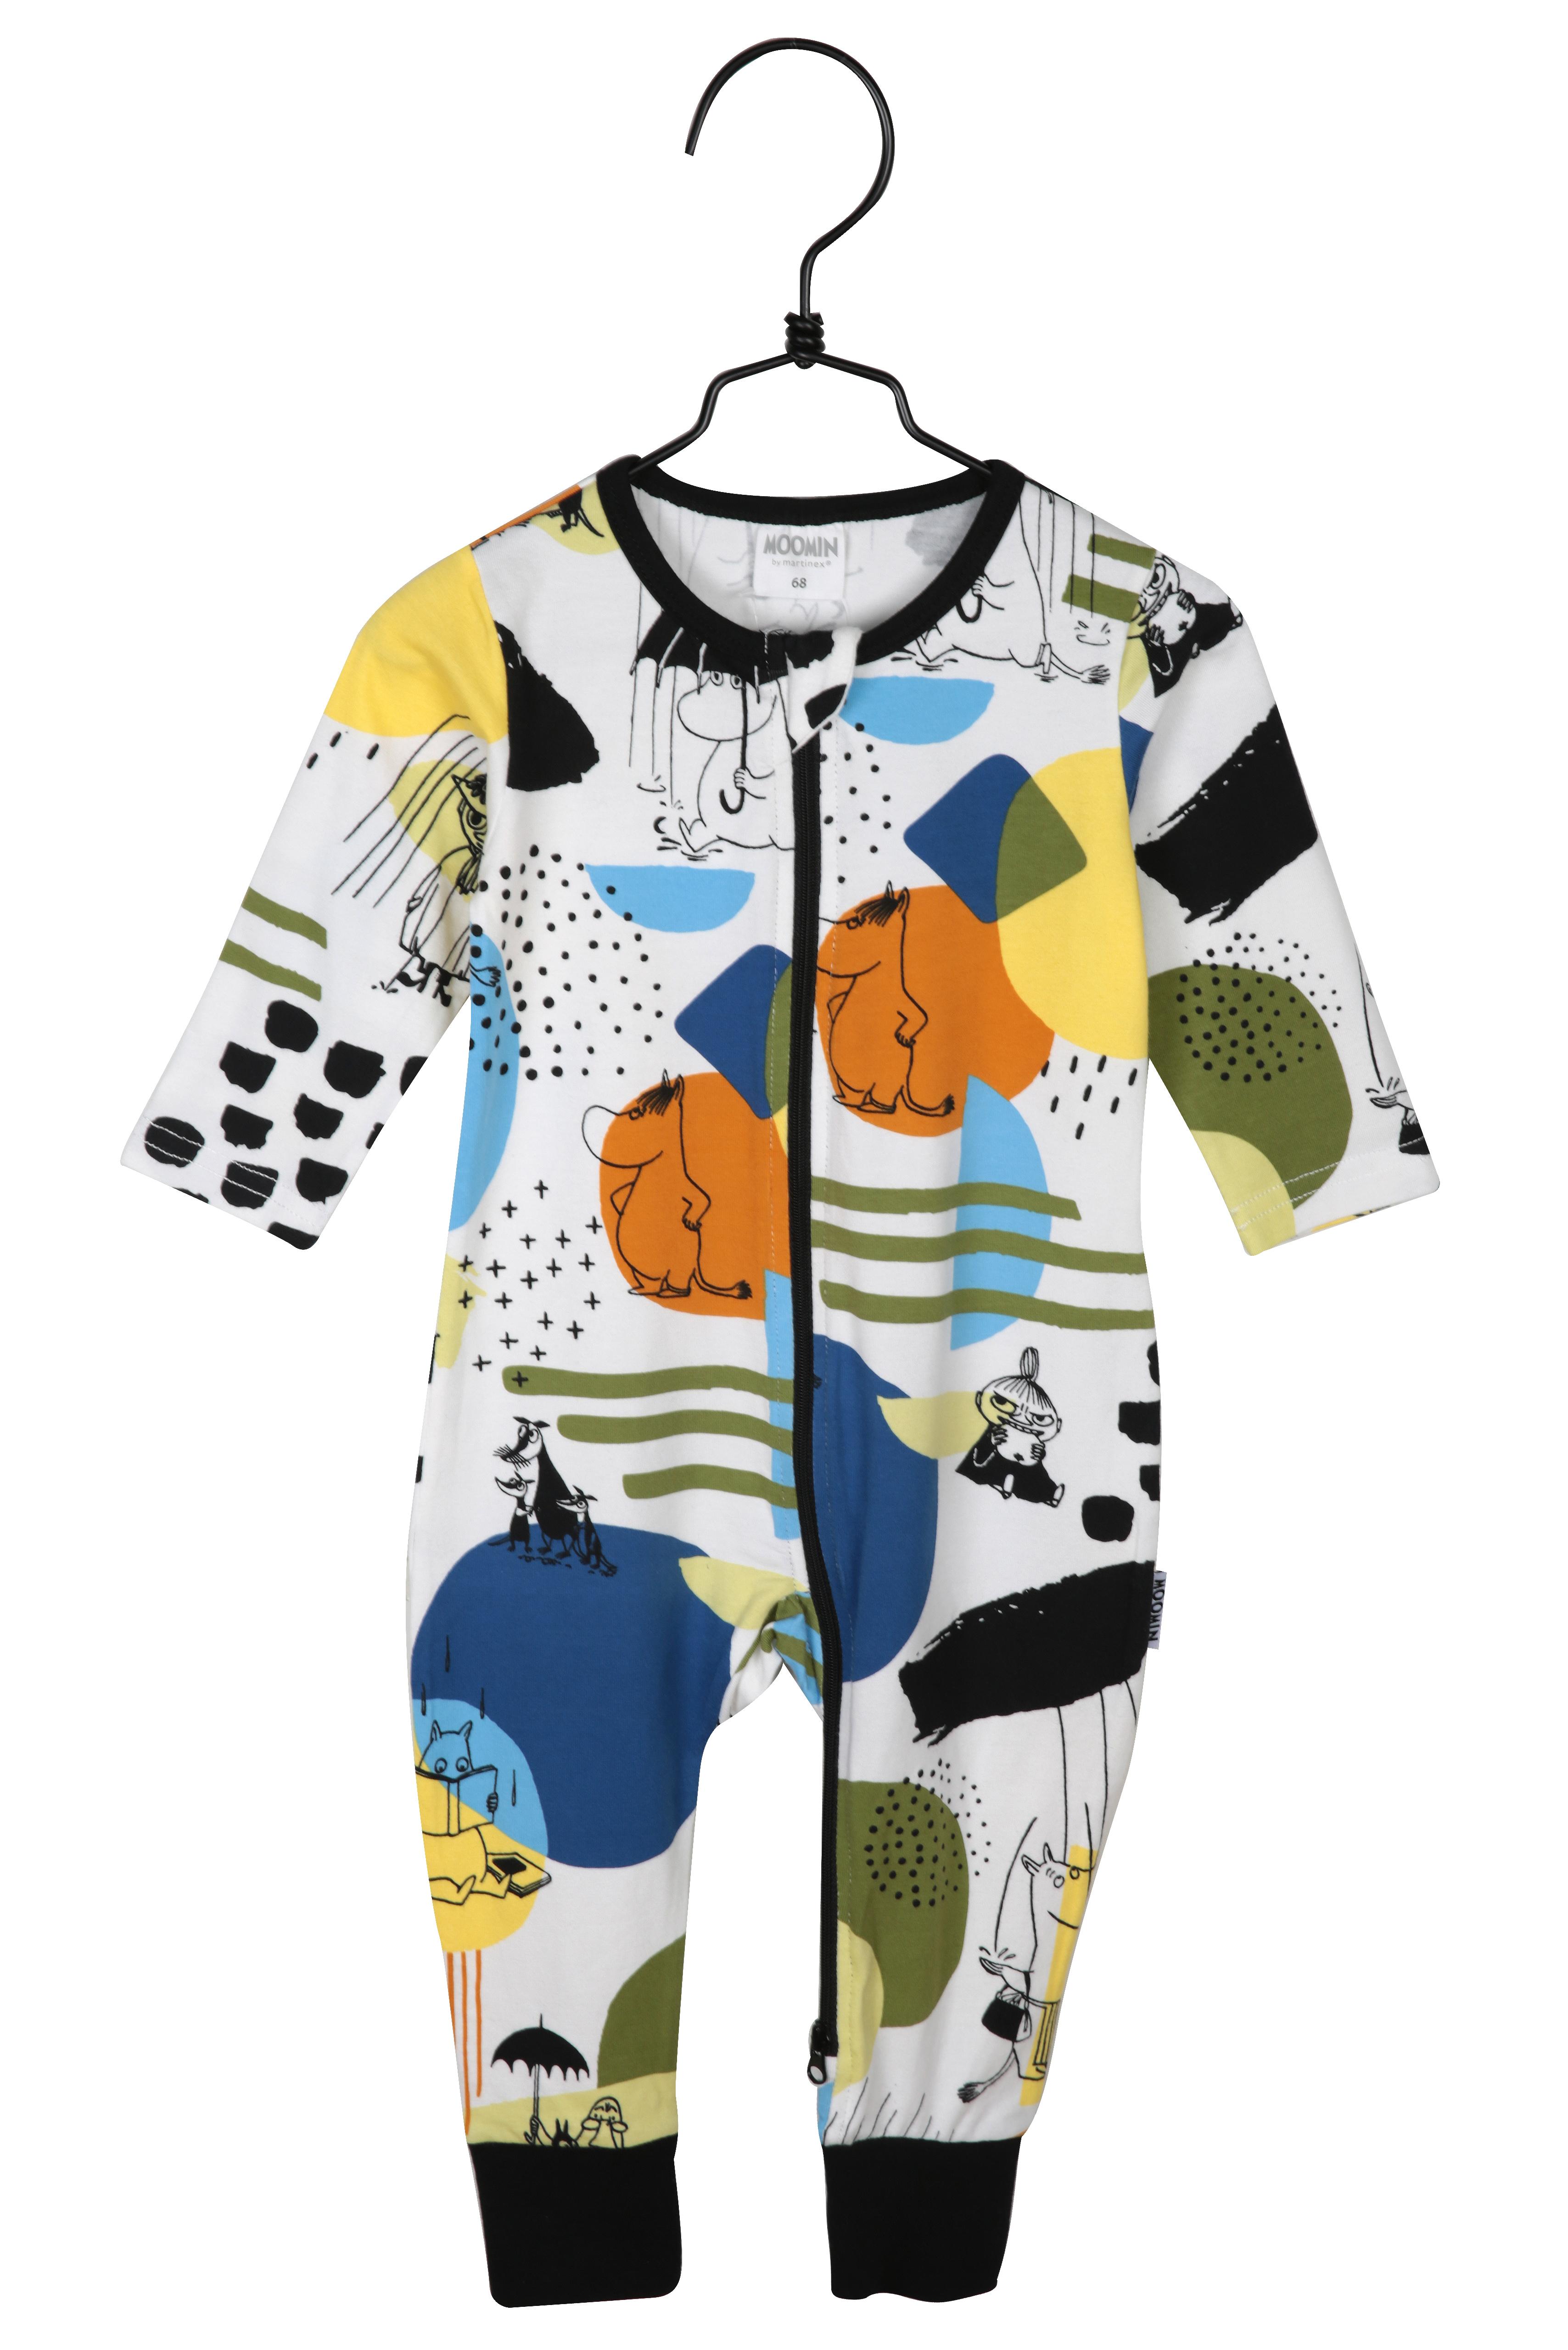 Martinex Joy Pyjamas Blue